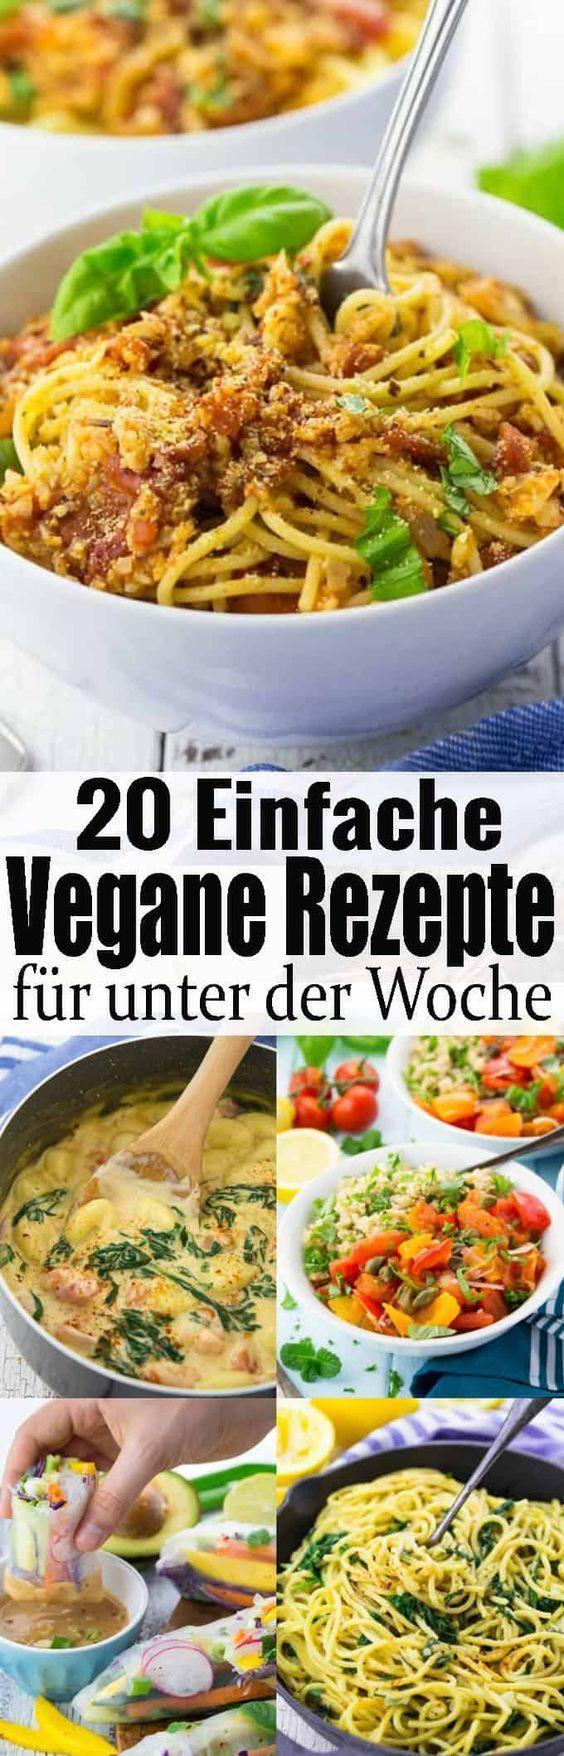 25 Vegane Rezepte Vegane Ernahrung Ganz Einfach Vegan Heaven Schnelle Vegetarische Rezepte Vegane Rezepte Rezepte